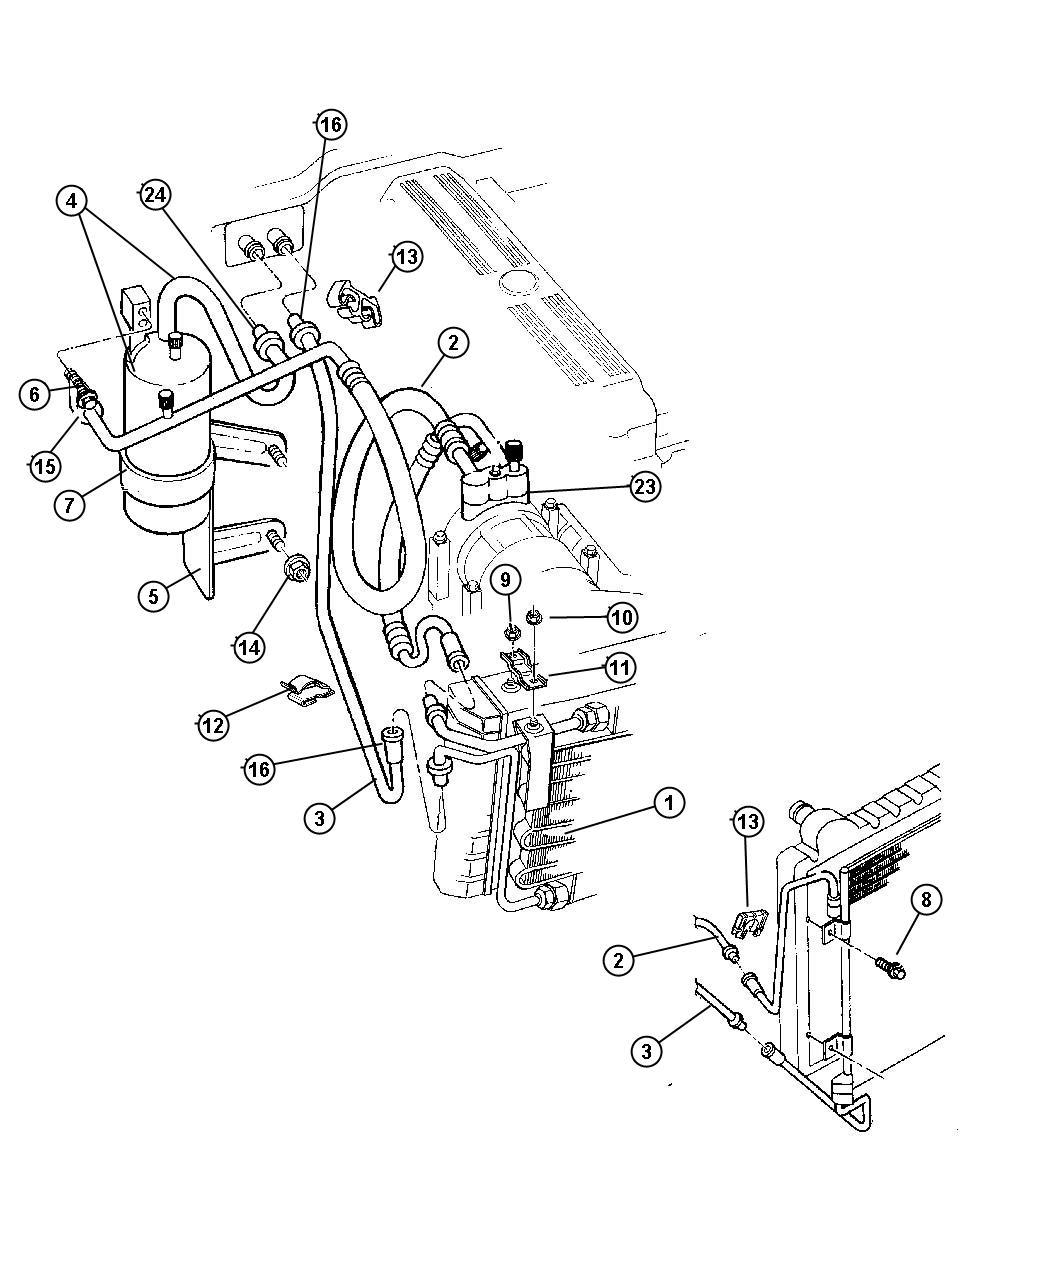 Jeep Cherokee Bracket Radiator To Condenser Bracket